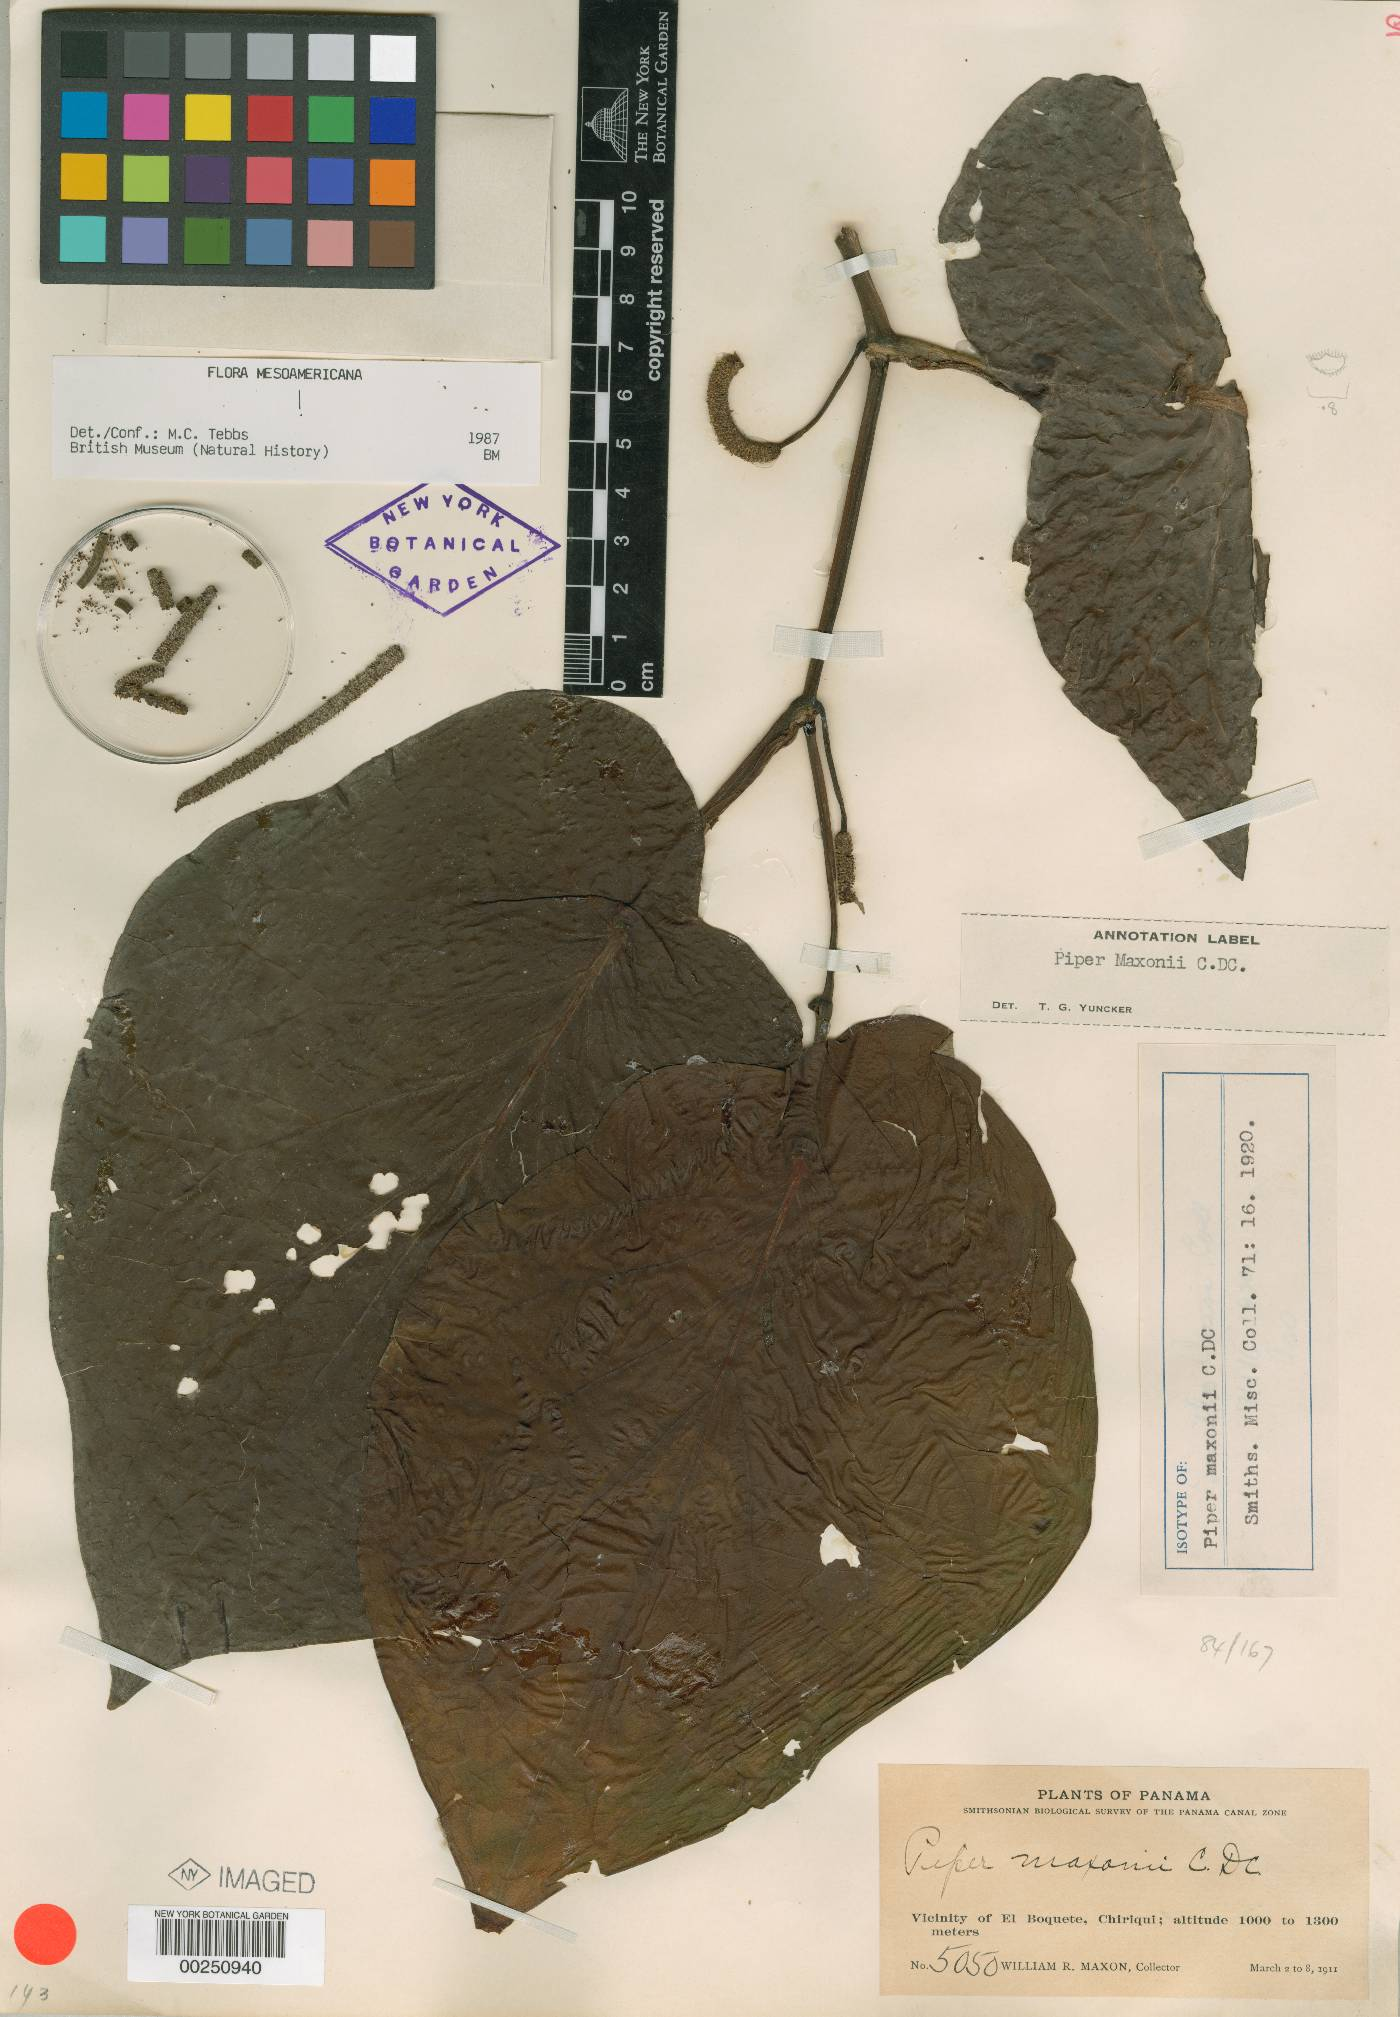 Piper maxonii image